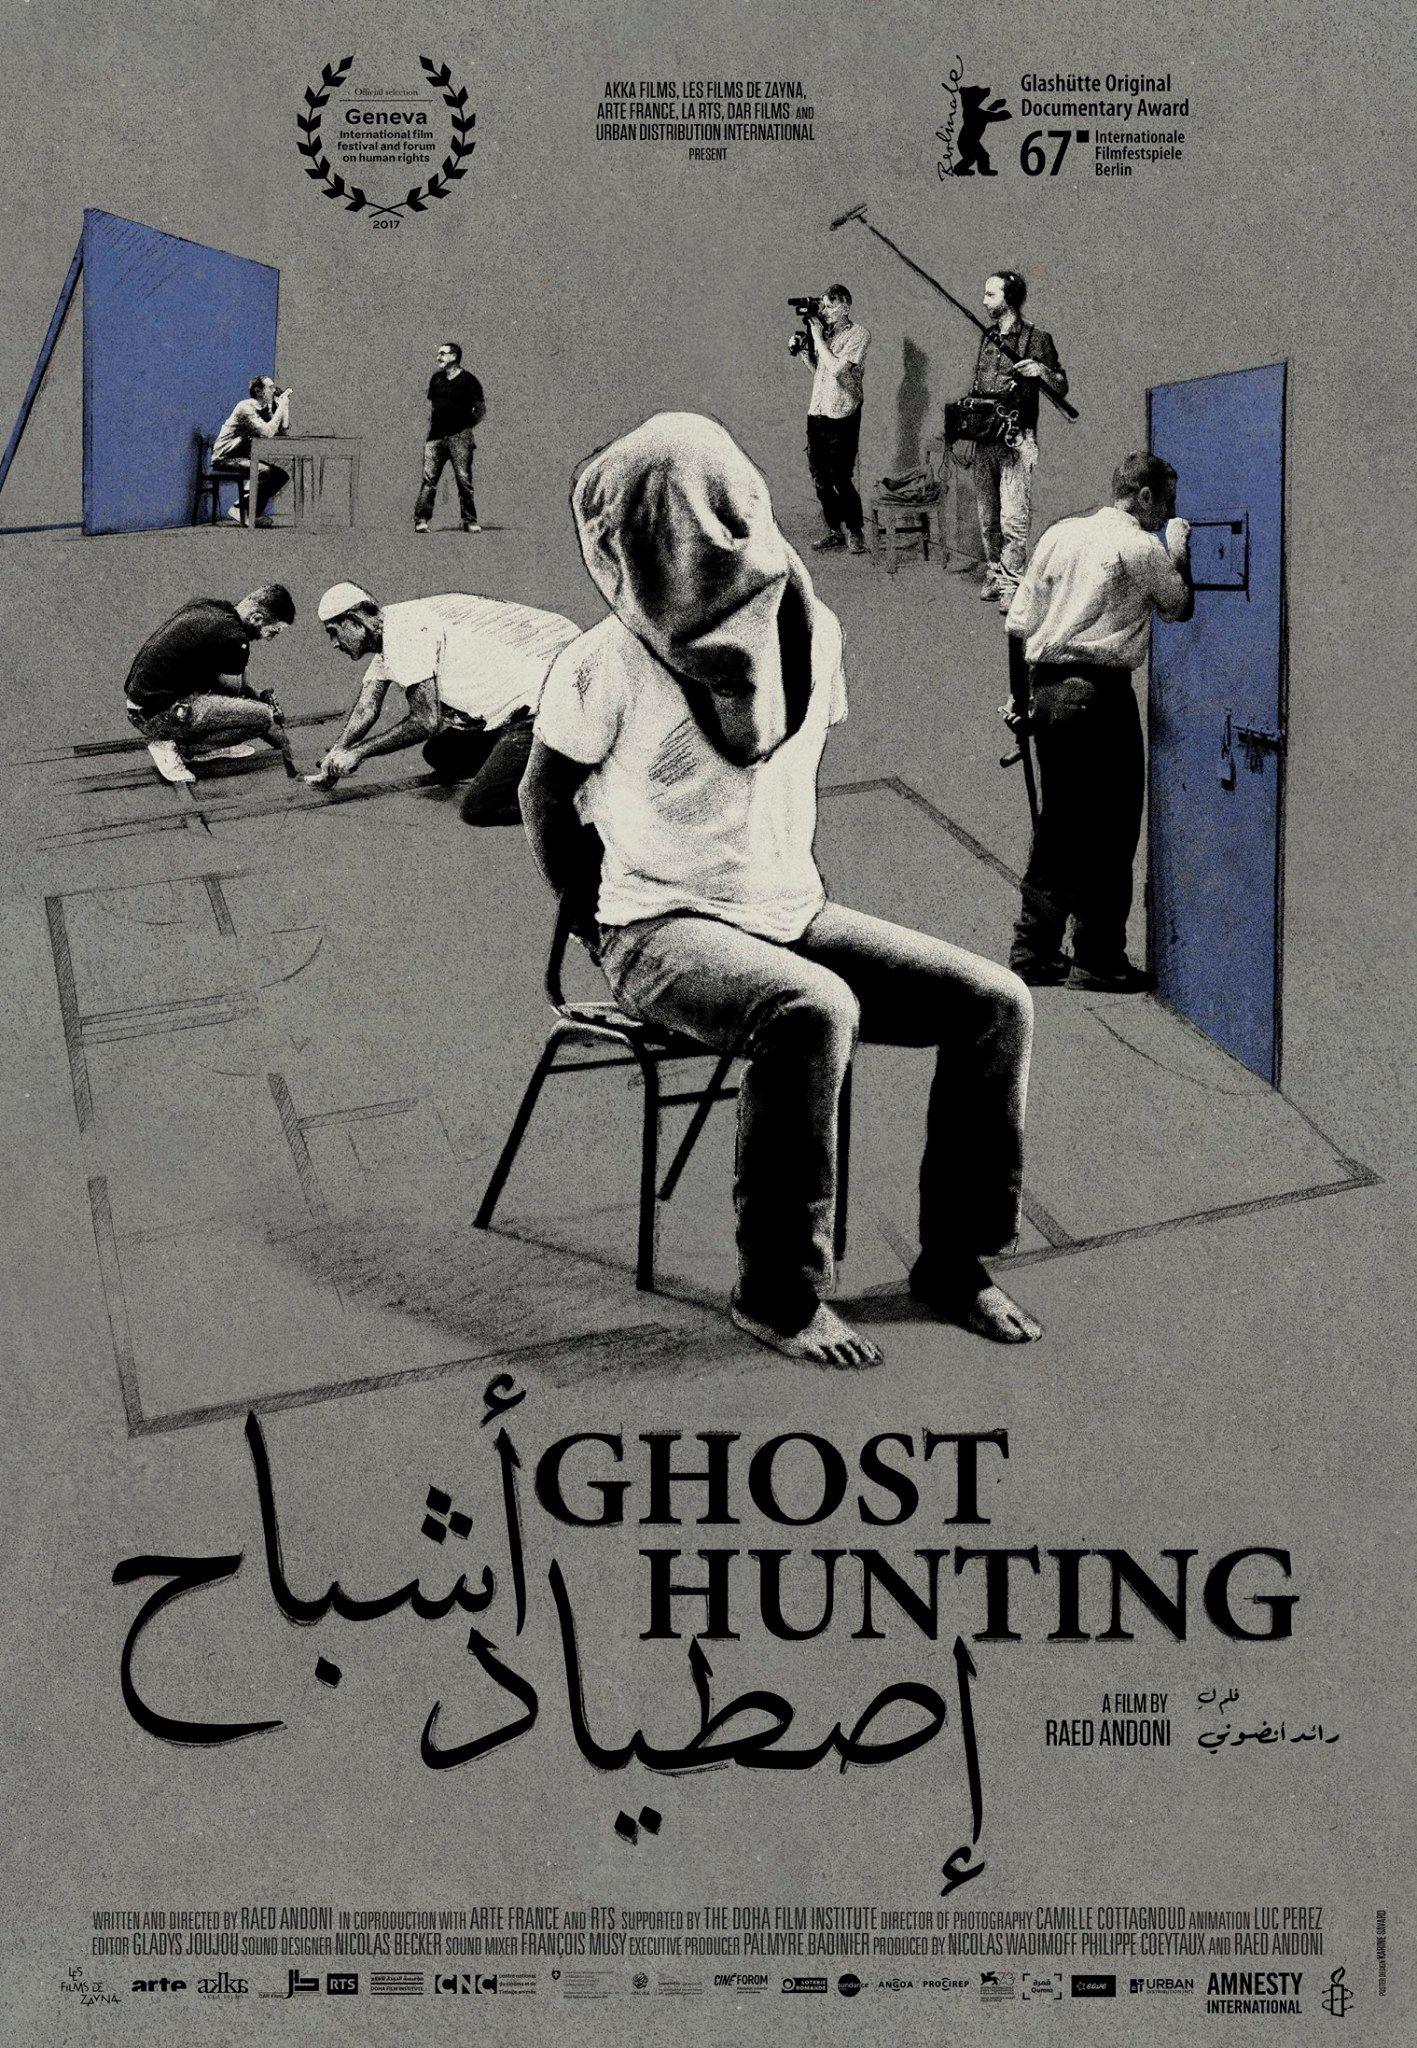 Afbeeldingsresultaat voor GHOST HUNTING film poster